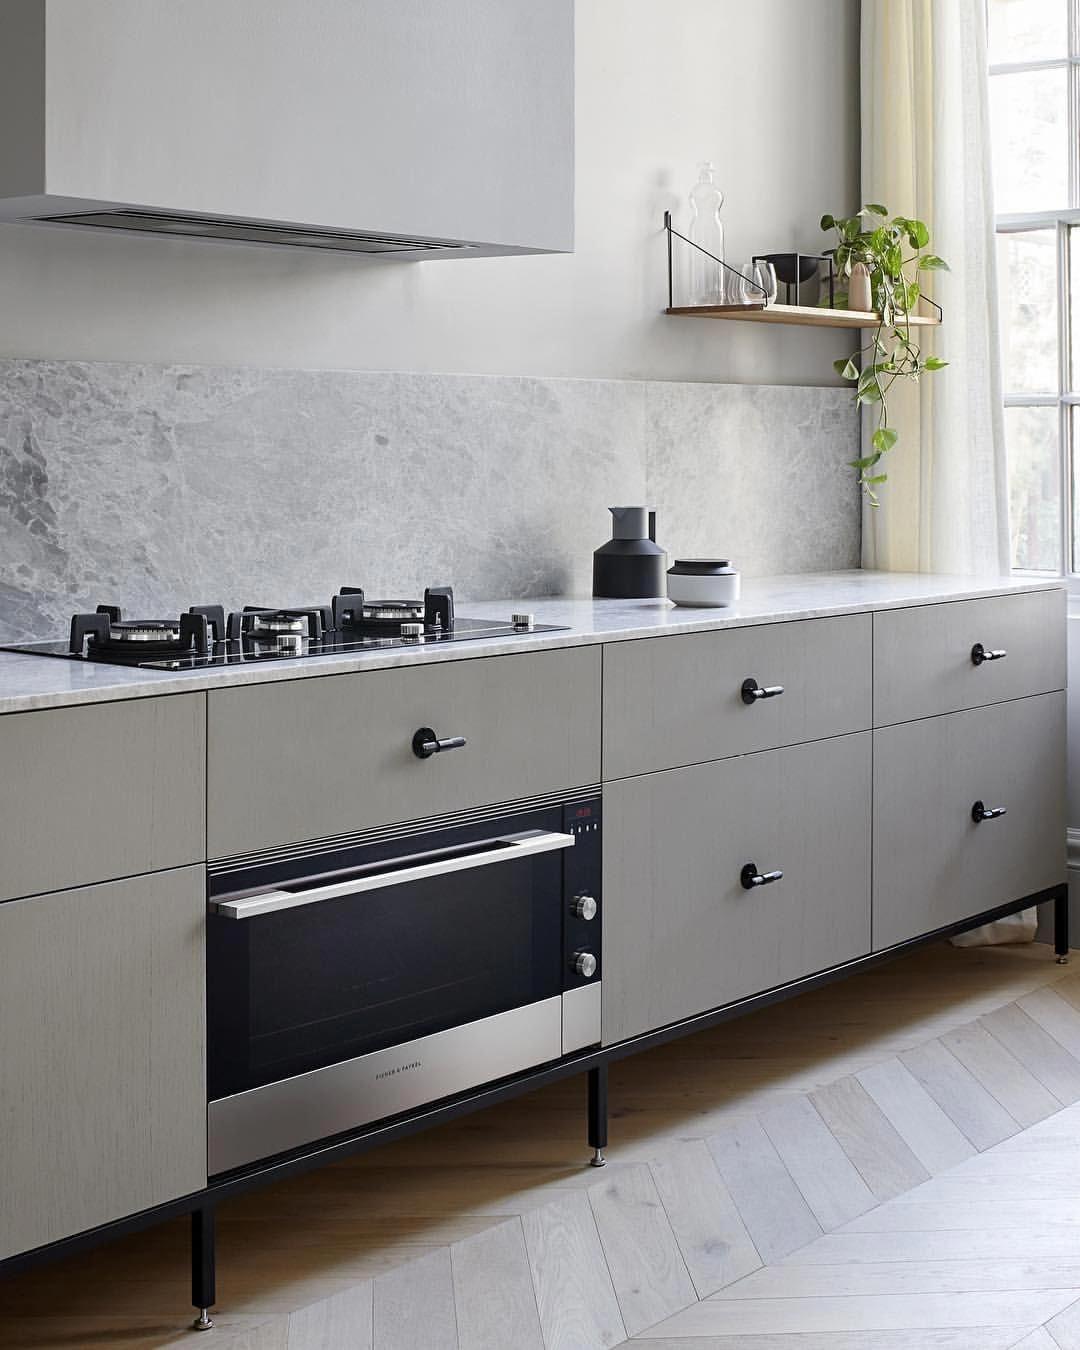 kitchen tips and techniques for contemporary interior design kitchen rh pinterest com